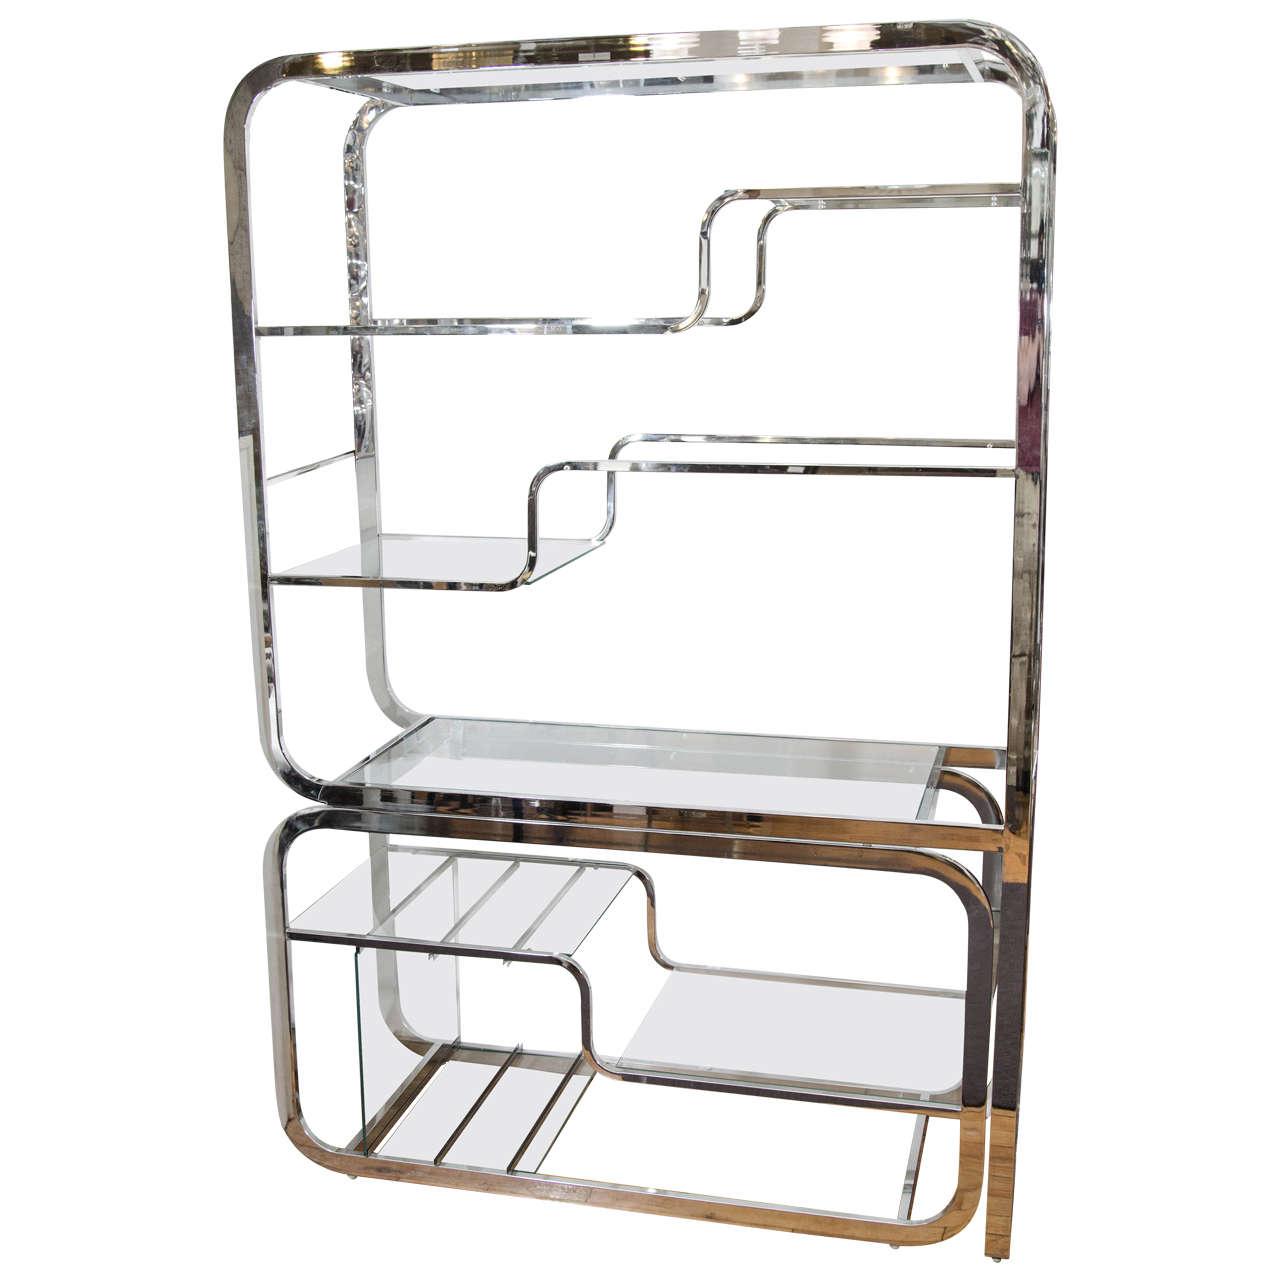 Midcentury Milo Baughman Chrome Room Divider Or Shelves For